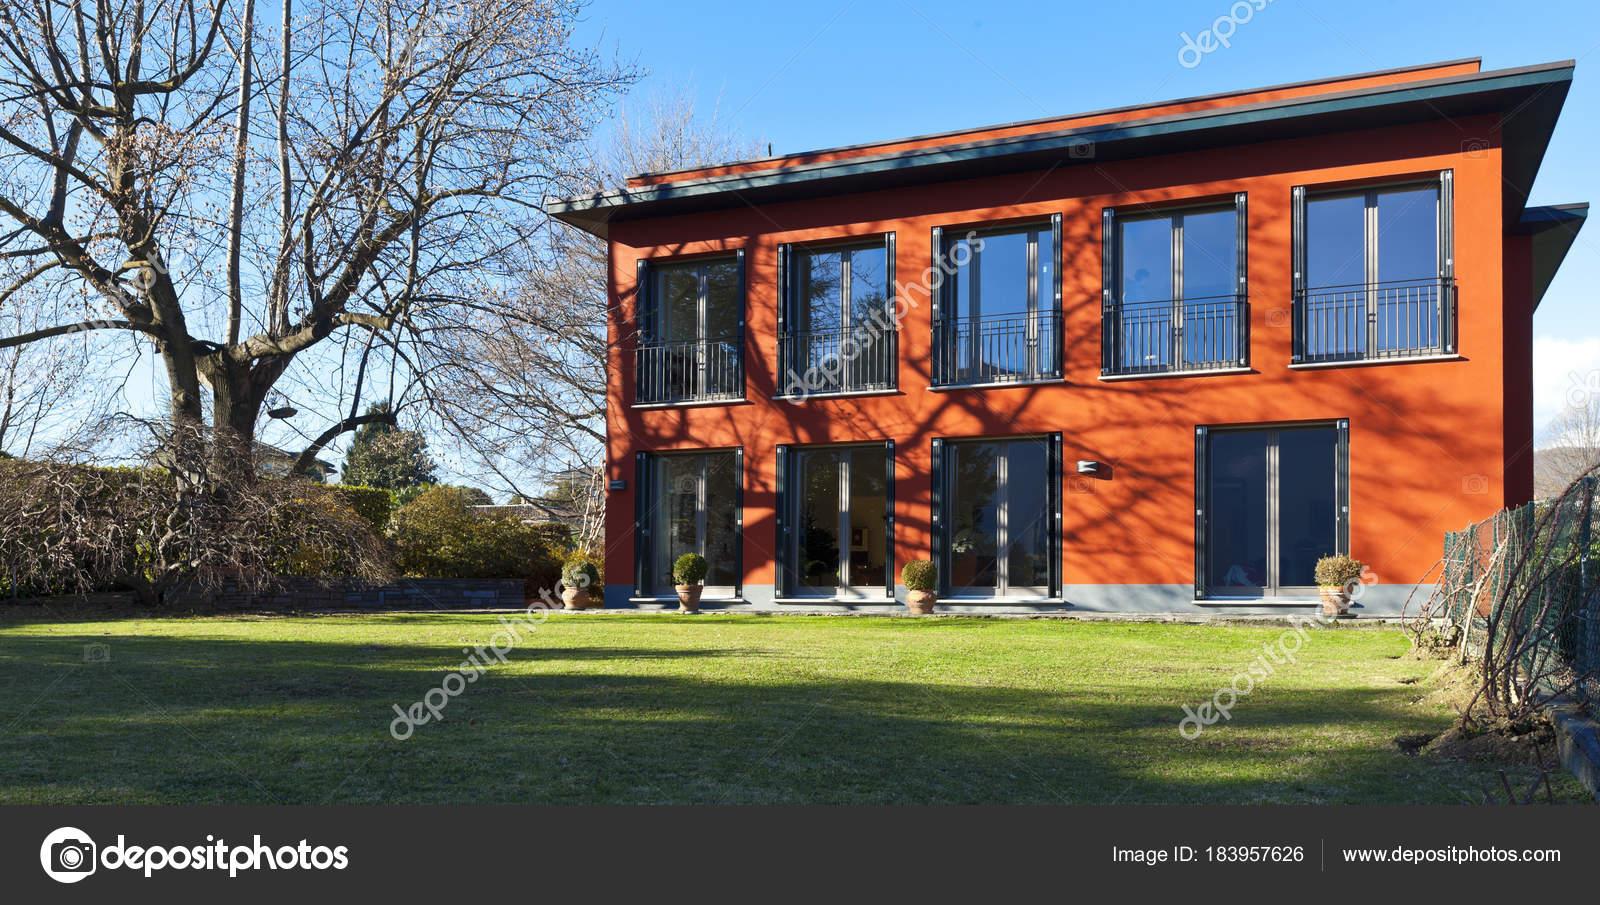 Mooie villa buiten u2014 stockfoto © zveiger #183957626